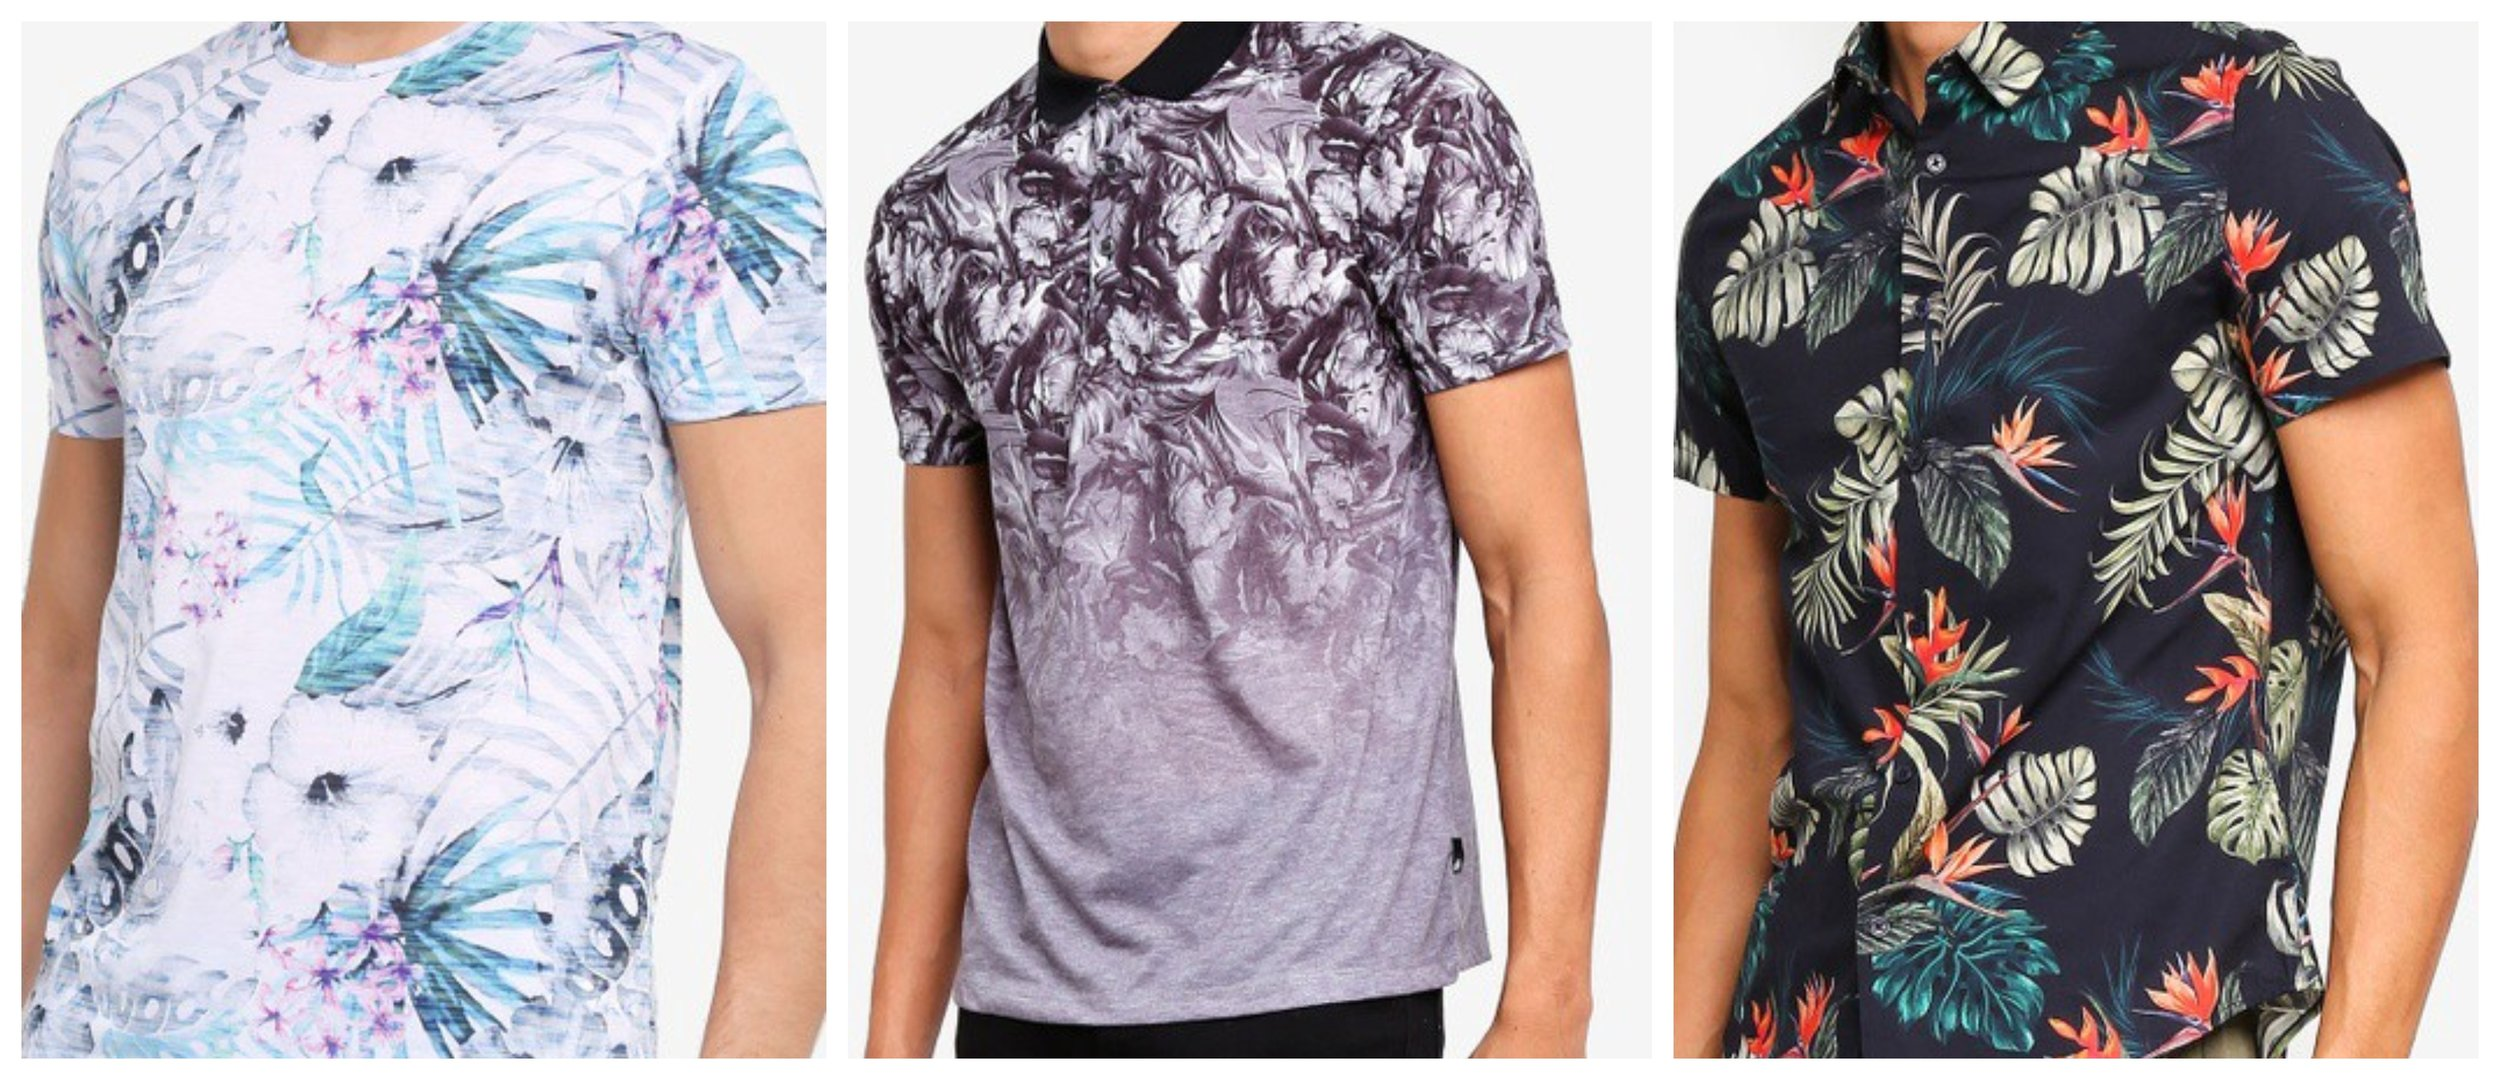 Pink And Aqua Floral All-Over Print T-Shirt   Charcoal Monochrome Floral Fade Polo Shirt   Black Short Sleeve Maui Print Shirt